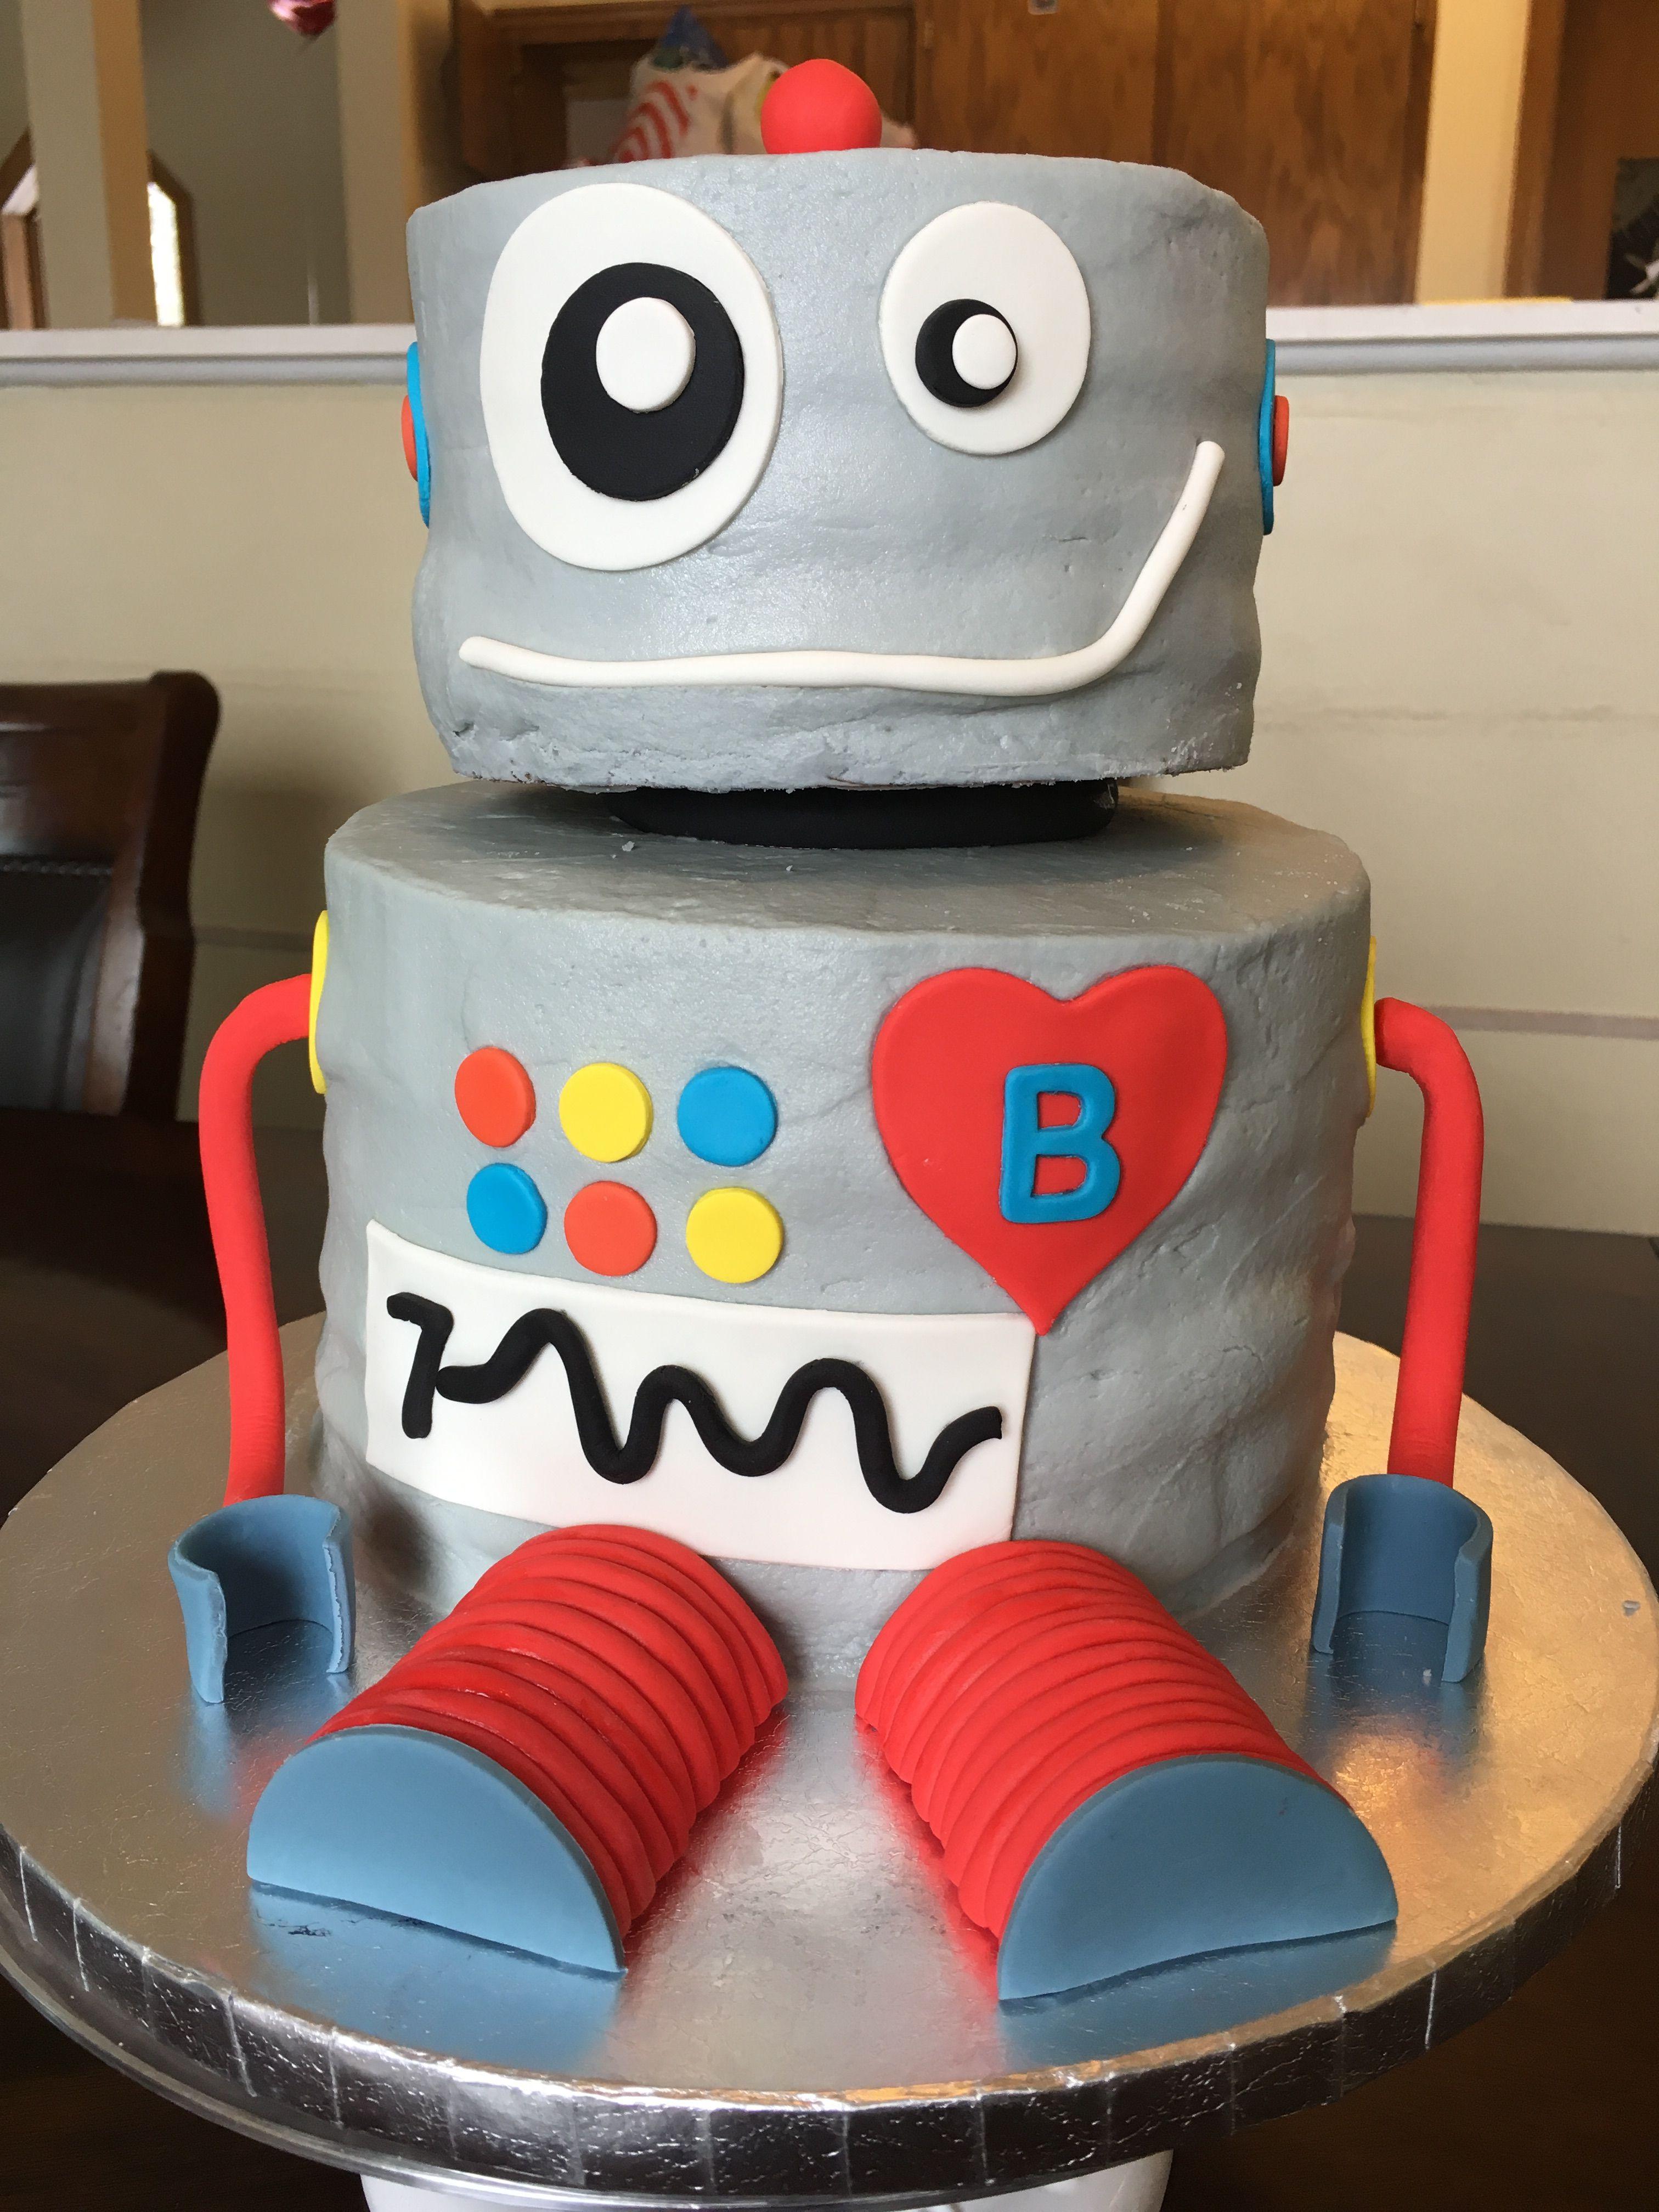 Enjoyable Robot Birthday Cake Boys Birthday Cake With Images Robot Funny Birthday Cards Online Alyptdamsfinfo